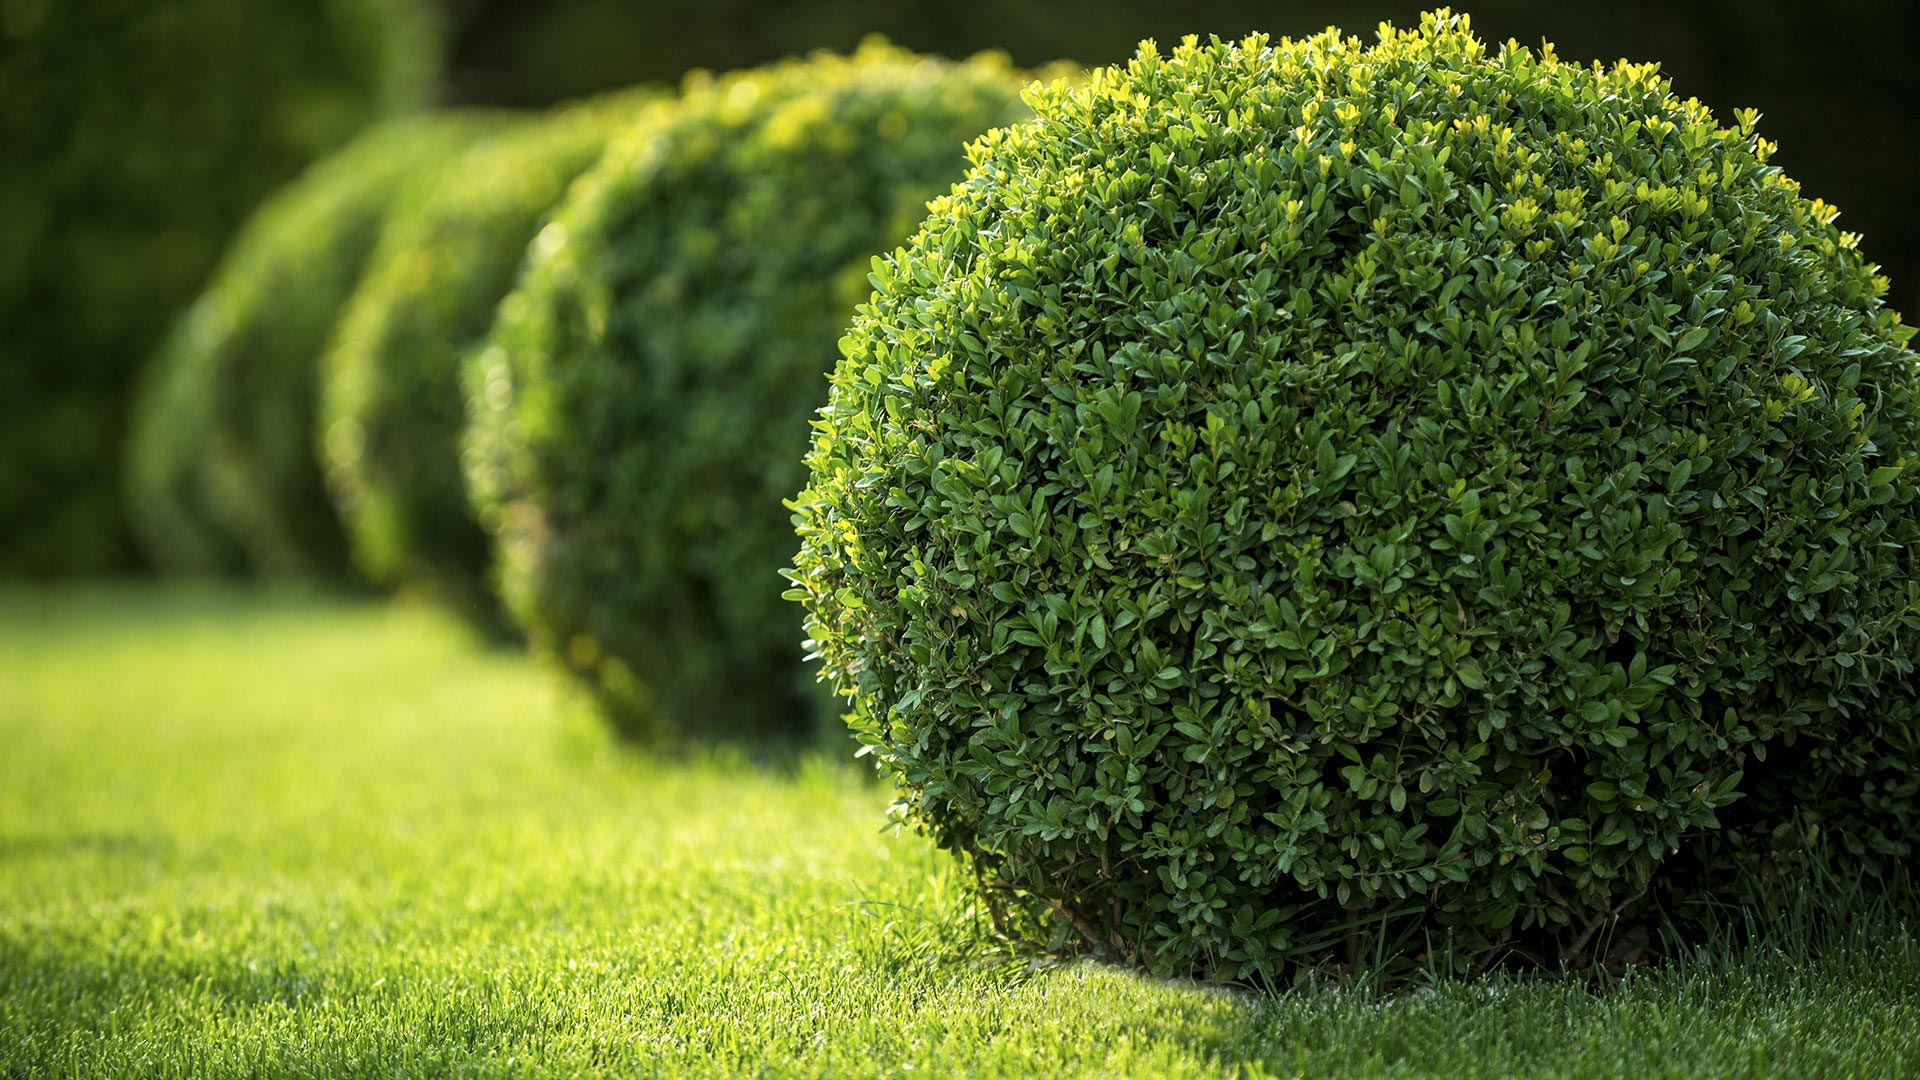 CLM Landscaping LLC Landscaping Company, Landscaper and Landscaping Services slide 1